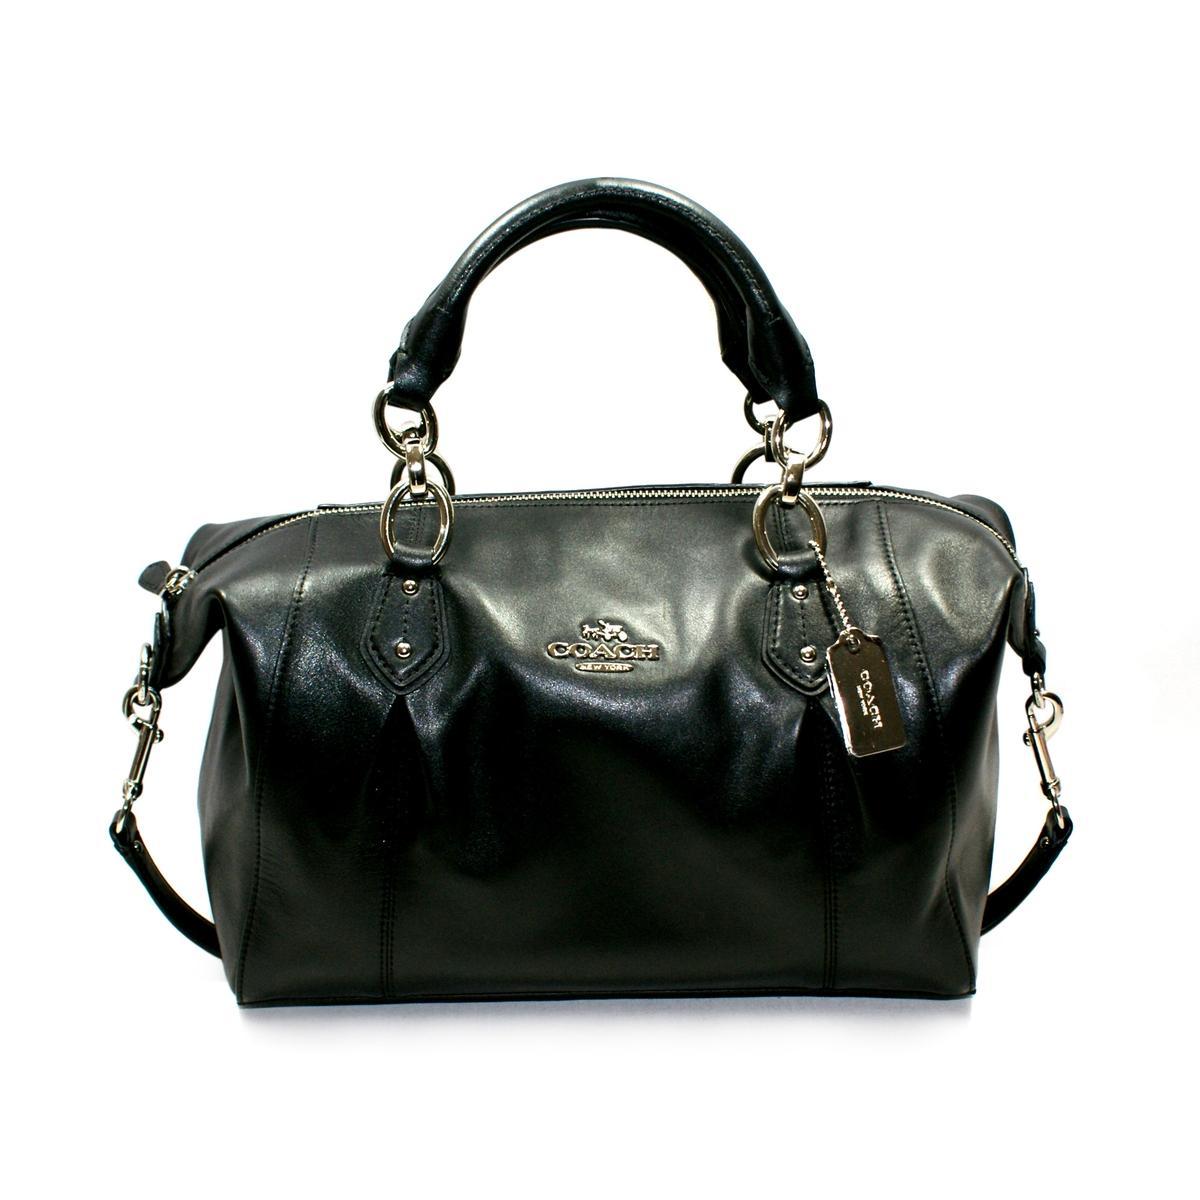 Coach Collette Leather Satchel Shoulder Bag Black 33806